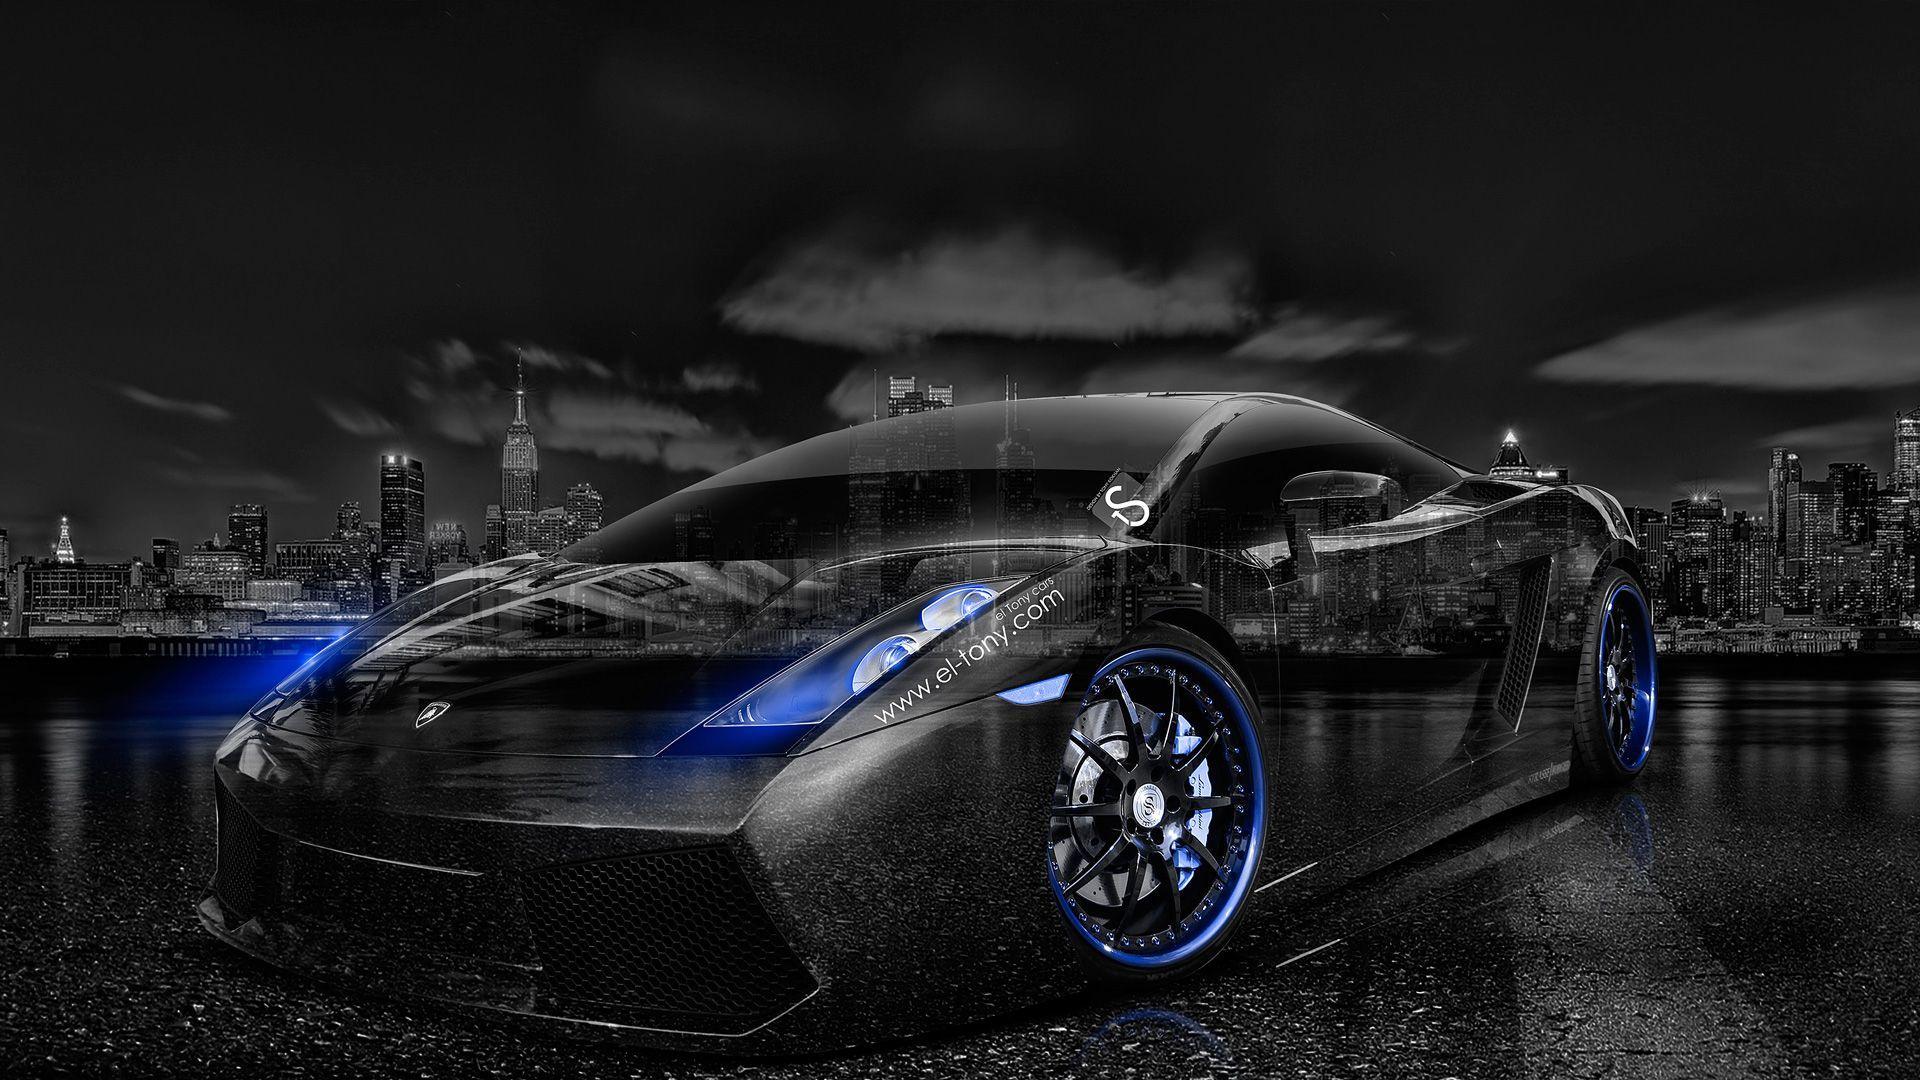 Neon Lamborghini Wallpapers Top Free Neon Lamborghini Backgrounds Wallpaperaccess